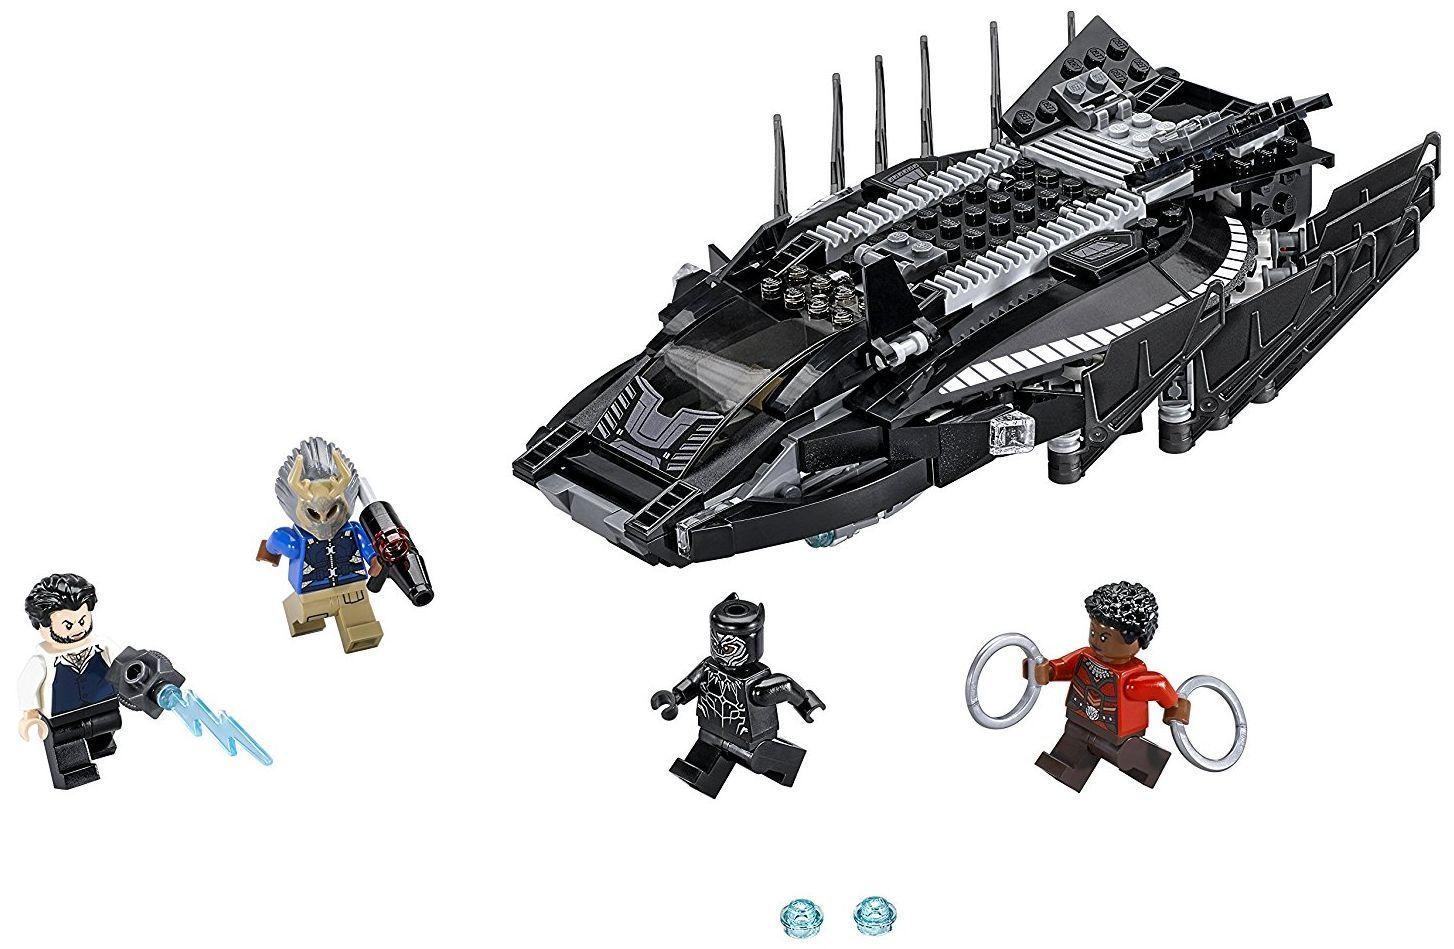 Конструктор Lego Super Heroes - Royal Talon Fighter Attack (76100) - 8